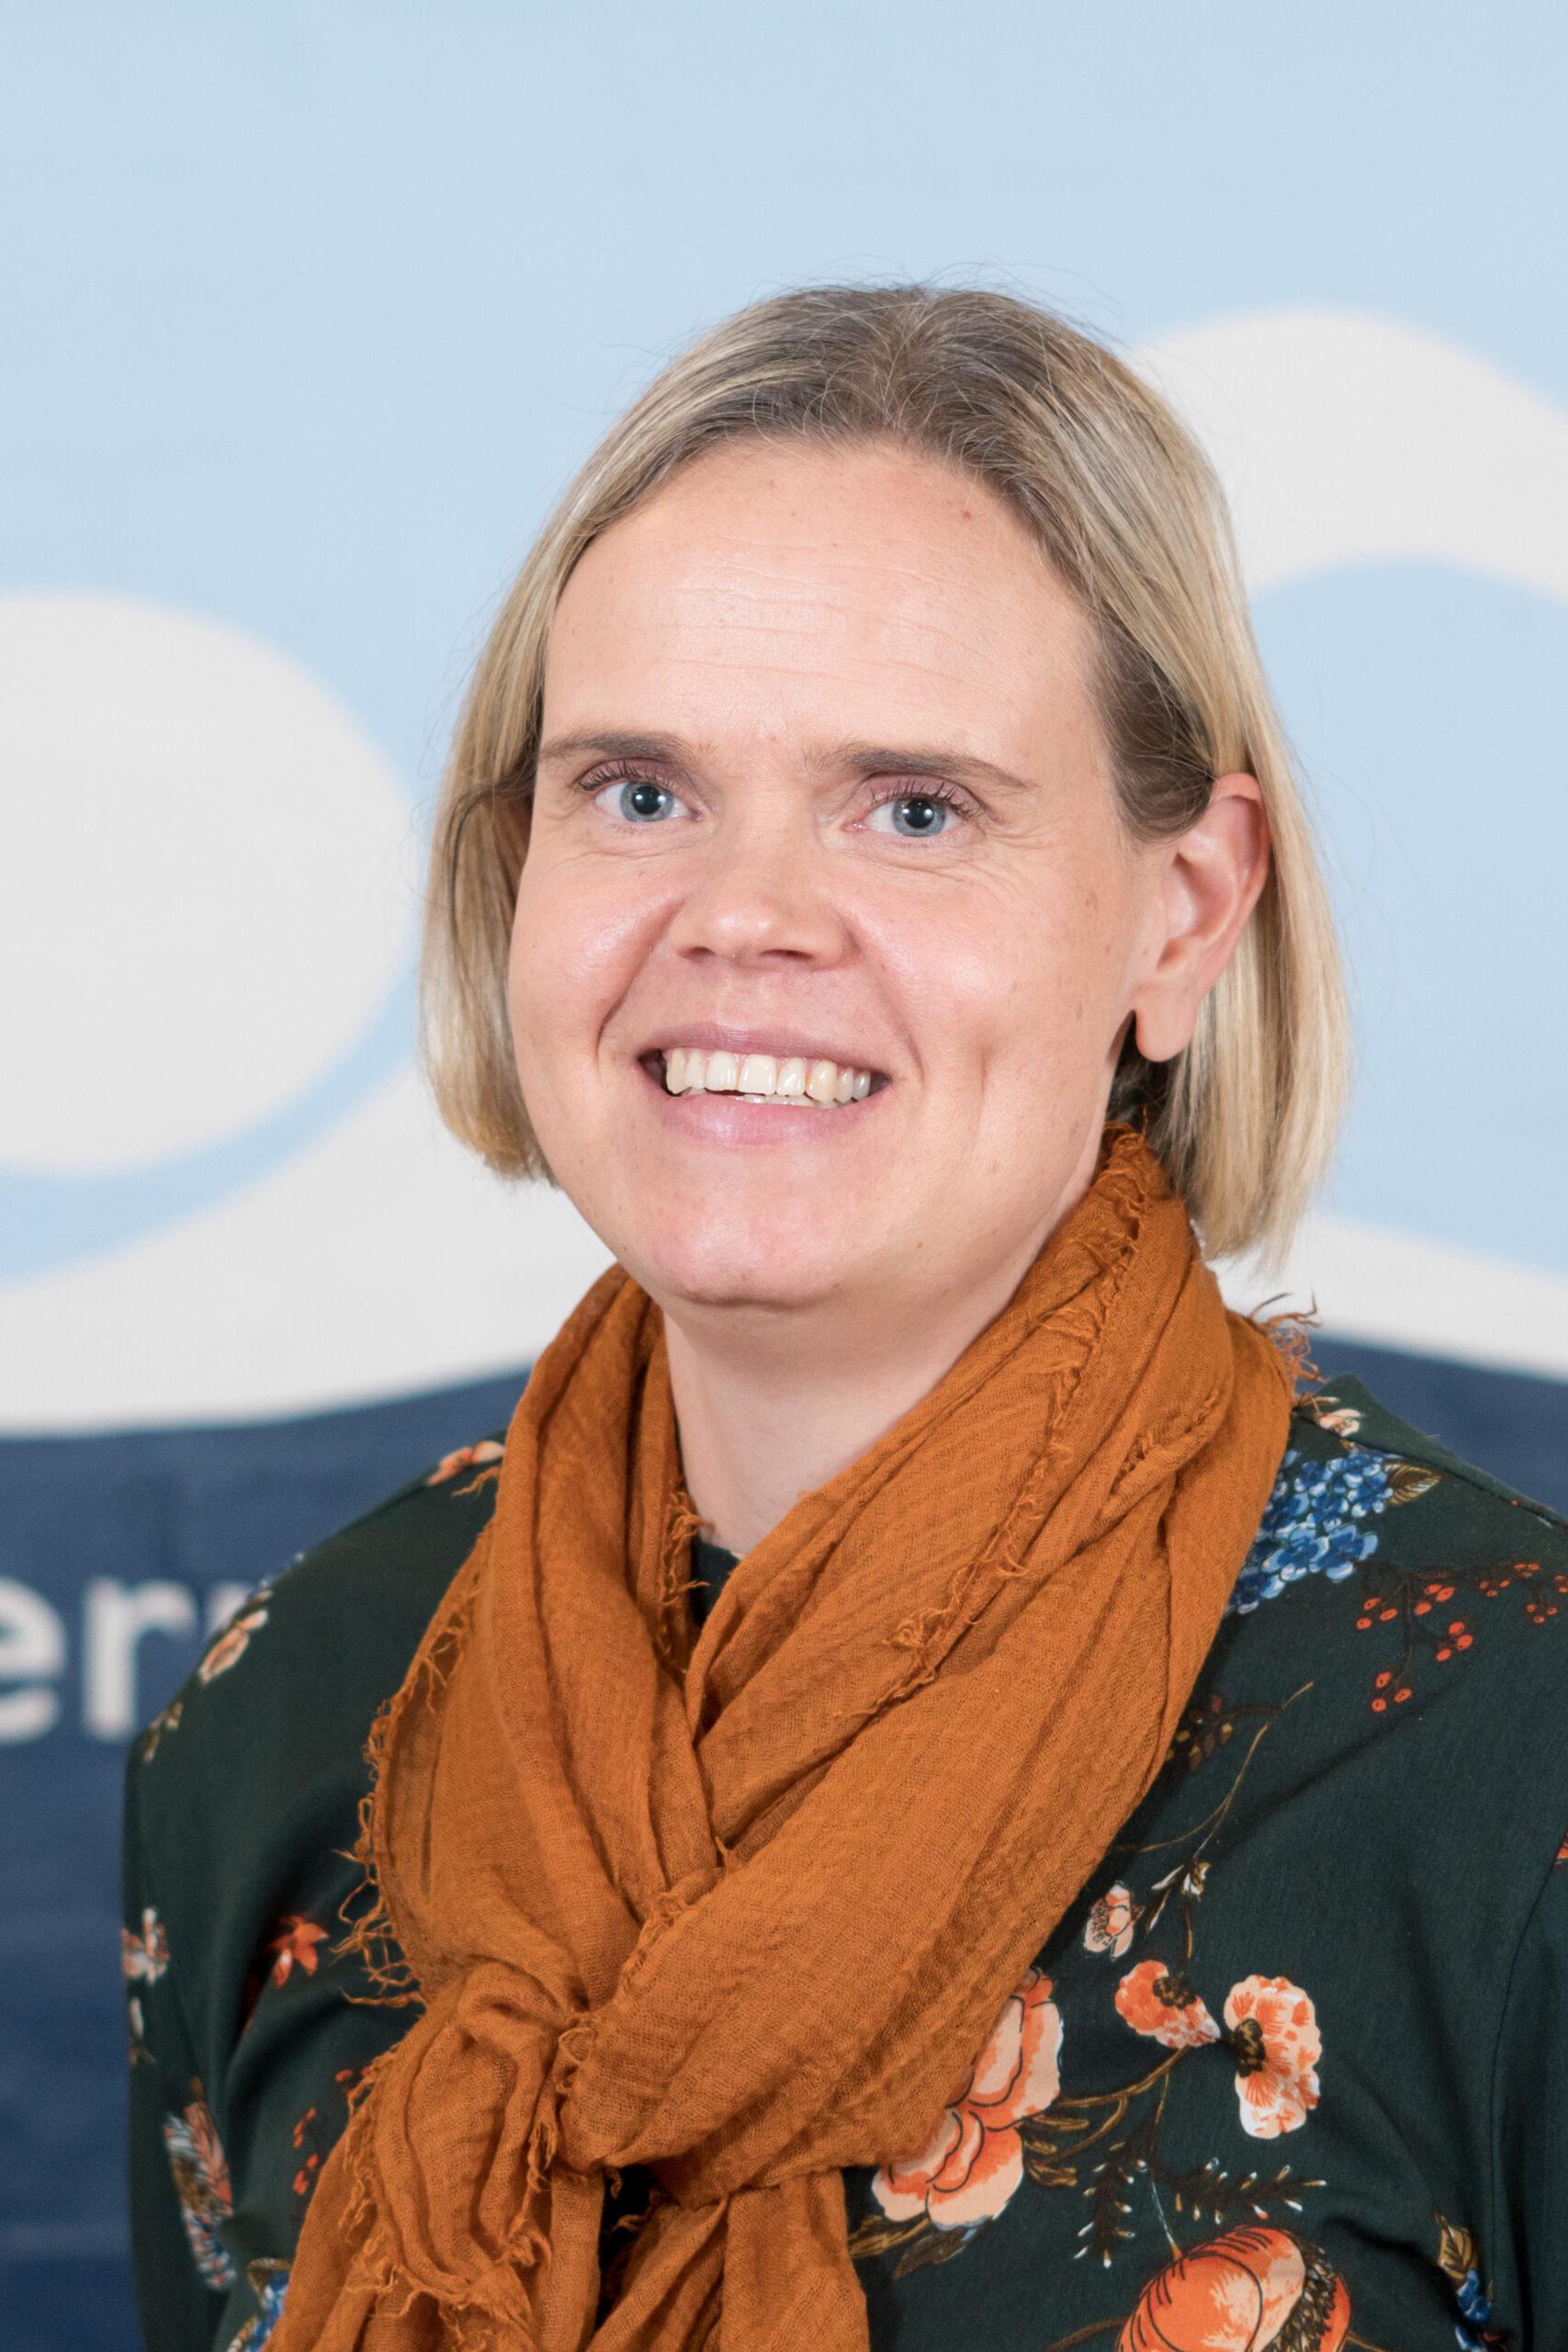 Pernille P. Frederiksen